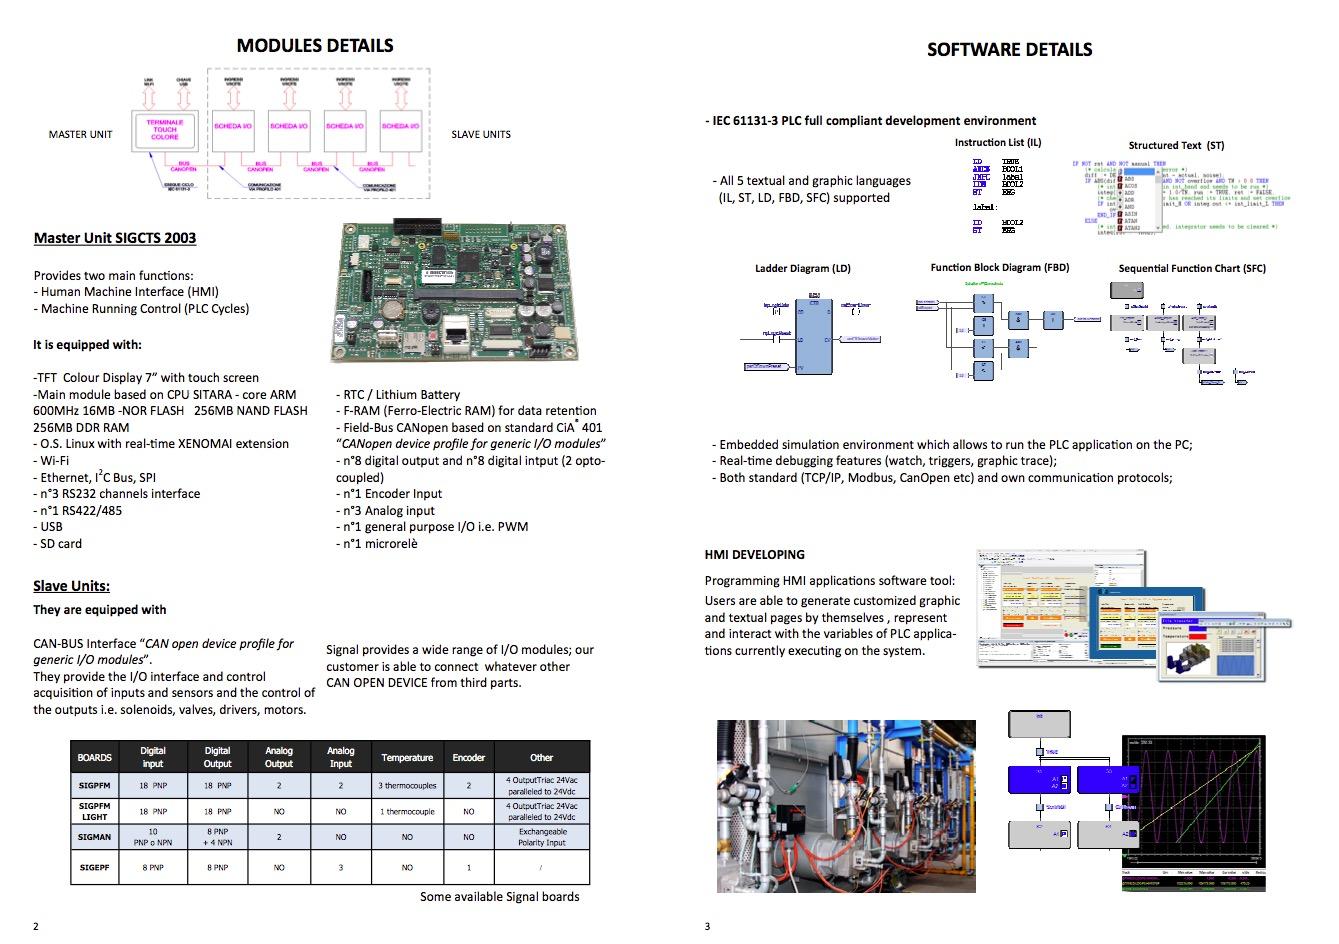 Programmable Logic Controller Modular System Signal Diagram For 8 To 3 Encoder Rev0 01 09 15 Part2